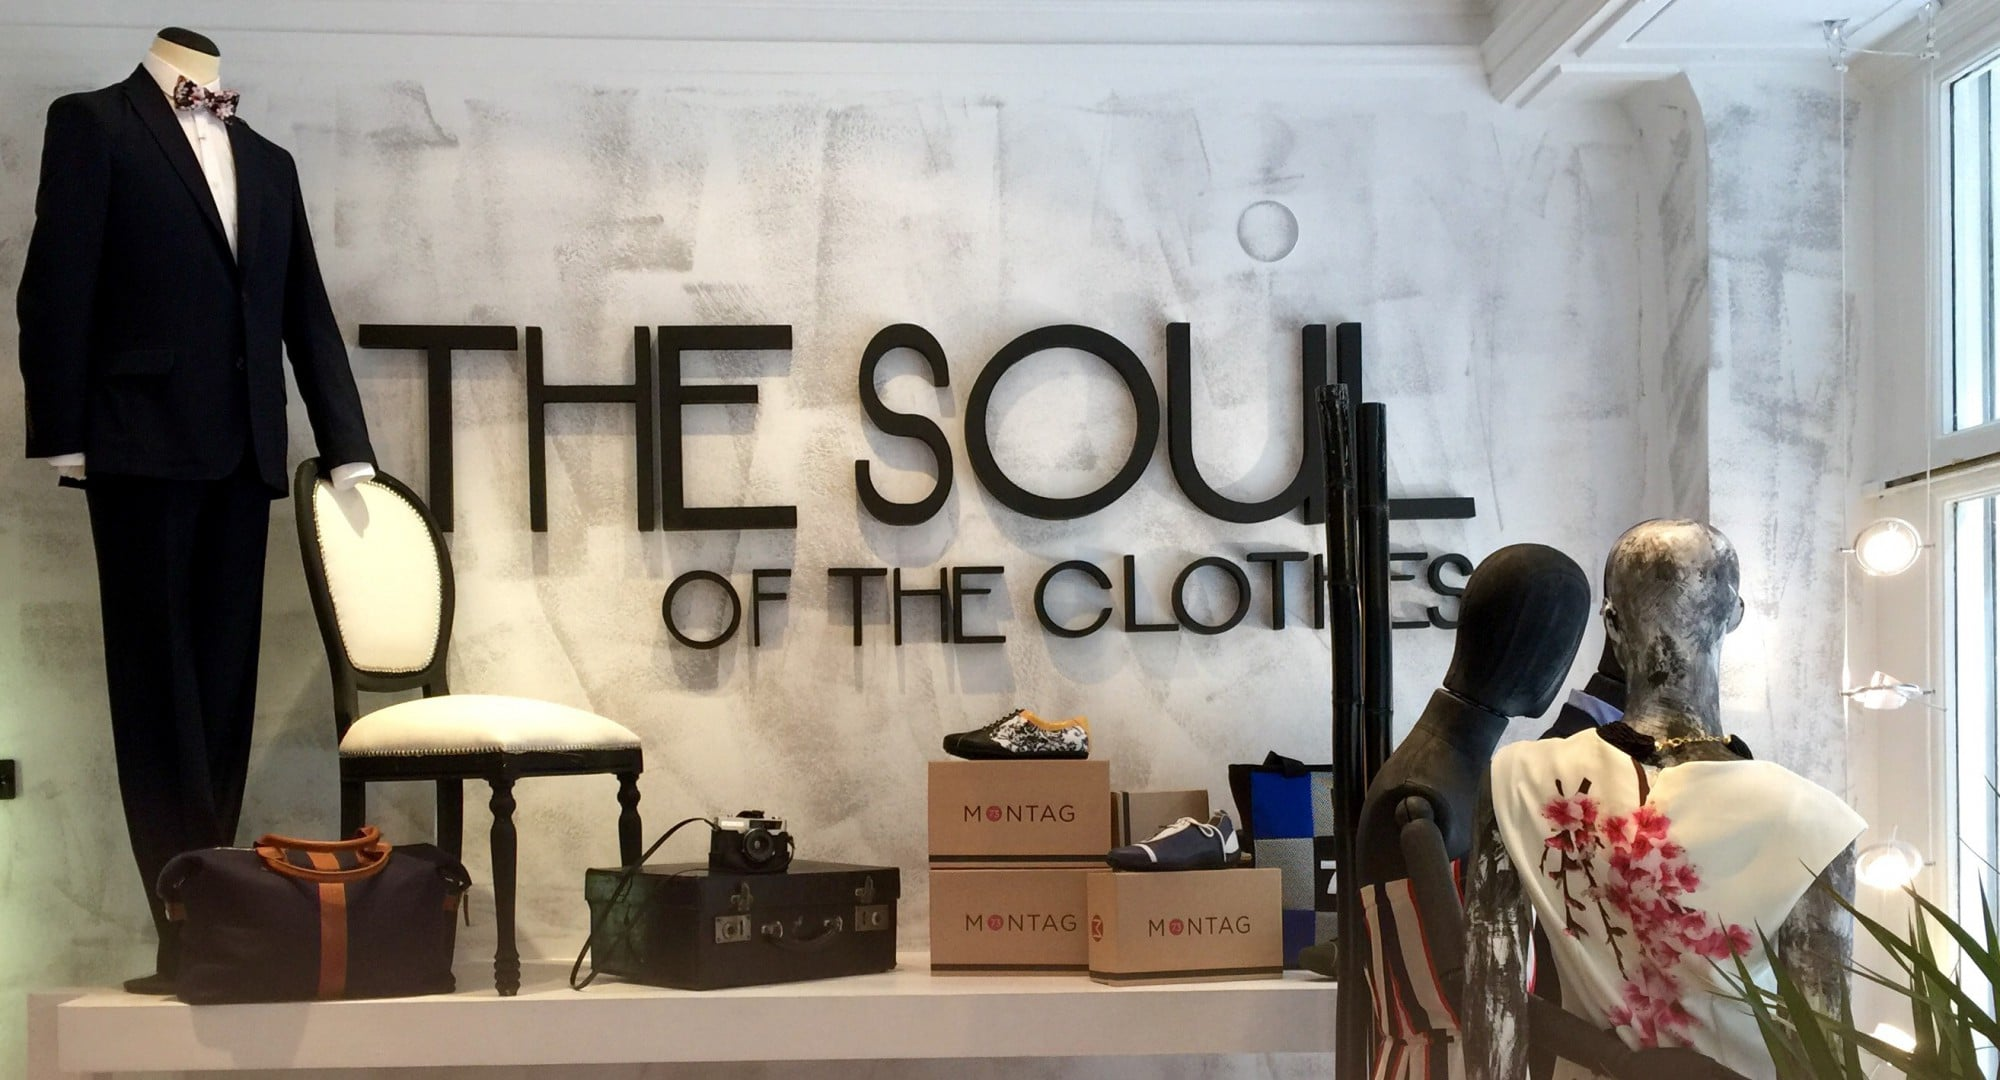 The-soul-of-the-clothes-en-el-ii-anigersariogasteiz. Jpg